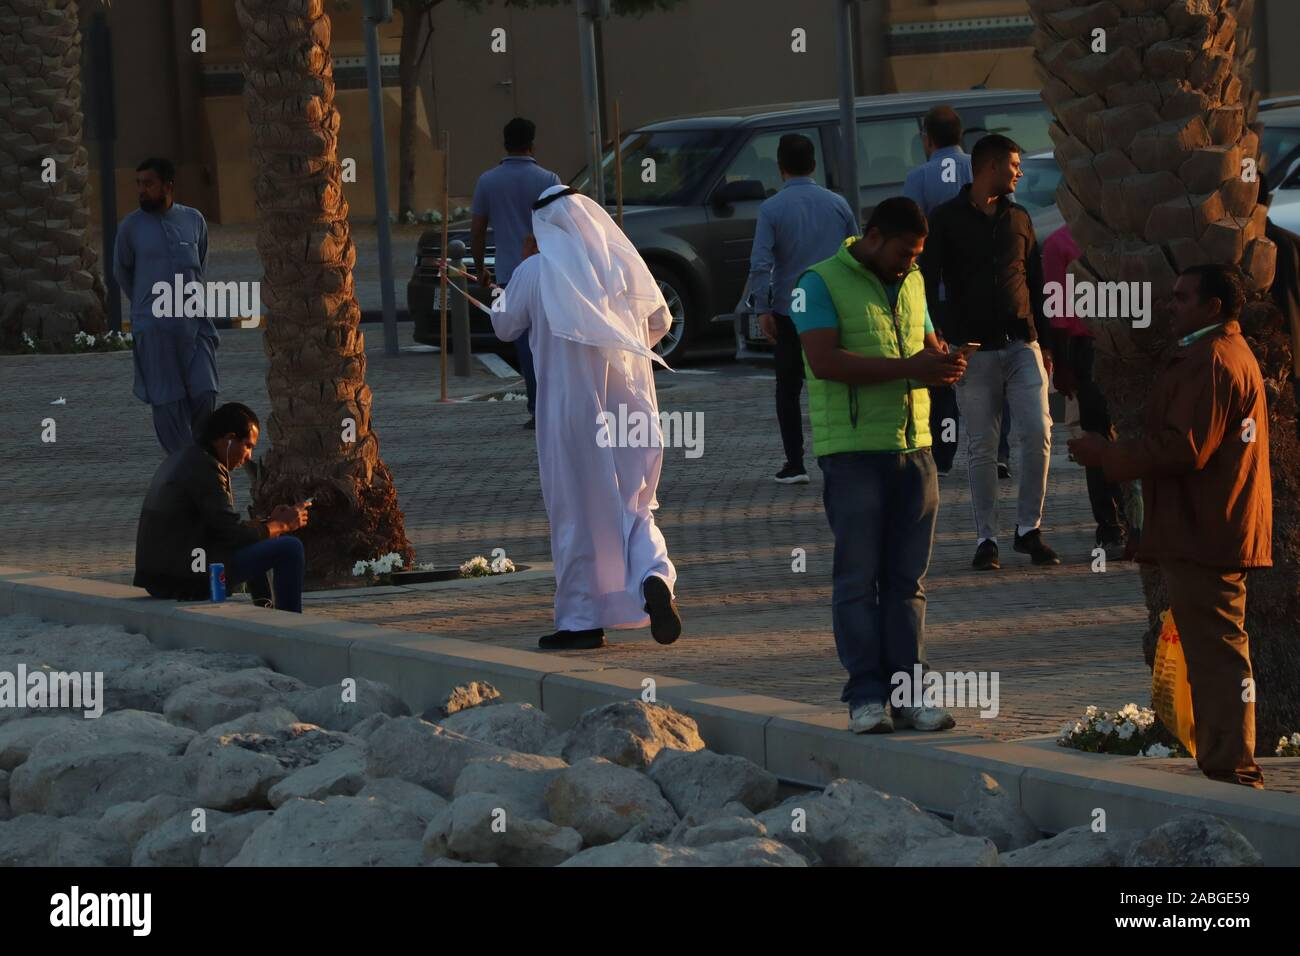 Kuwaiti man in traditional white robe (dishdasha) talking on the phone with Asian expatriates around him on the sidewalk Stock Photo